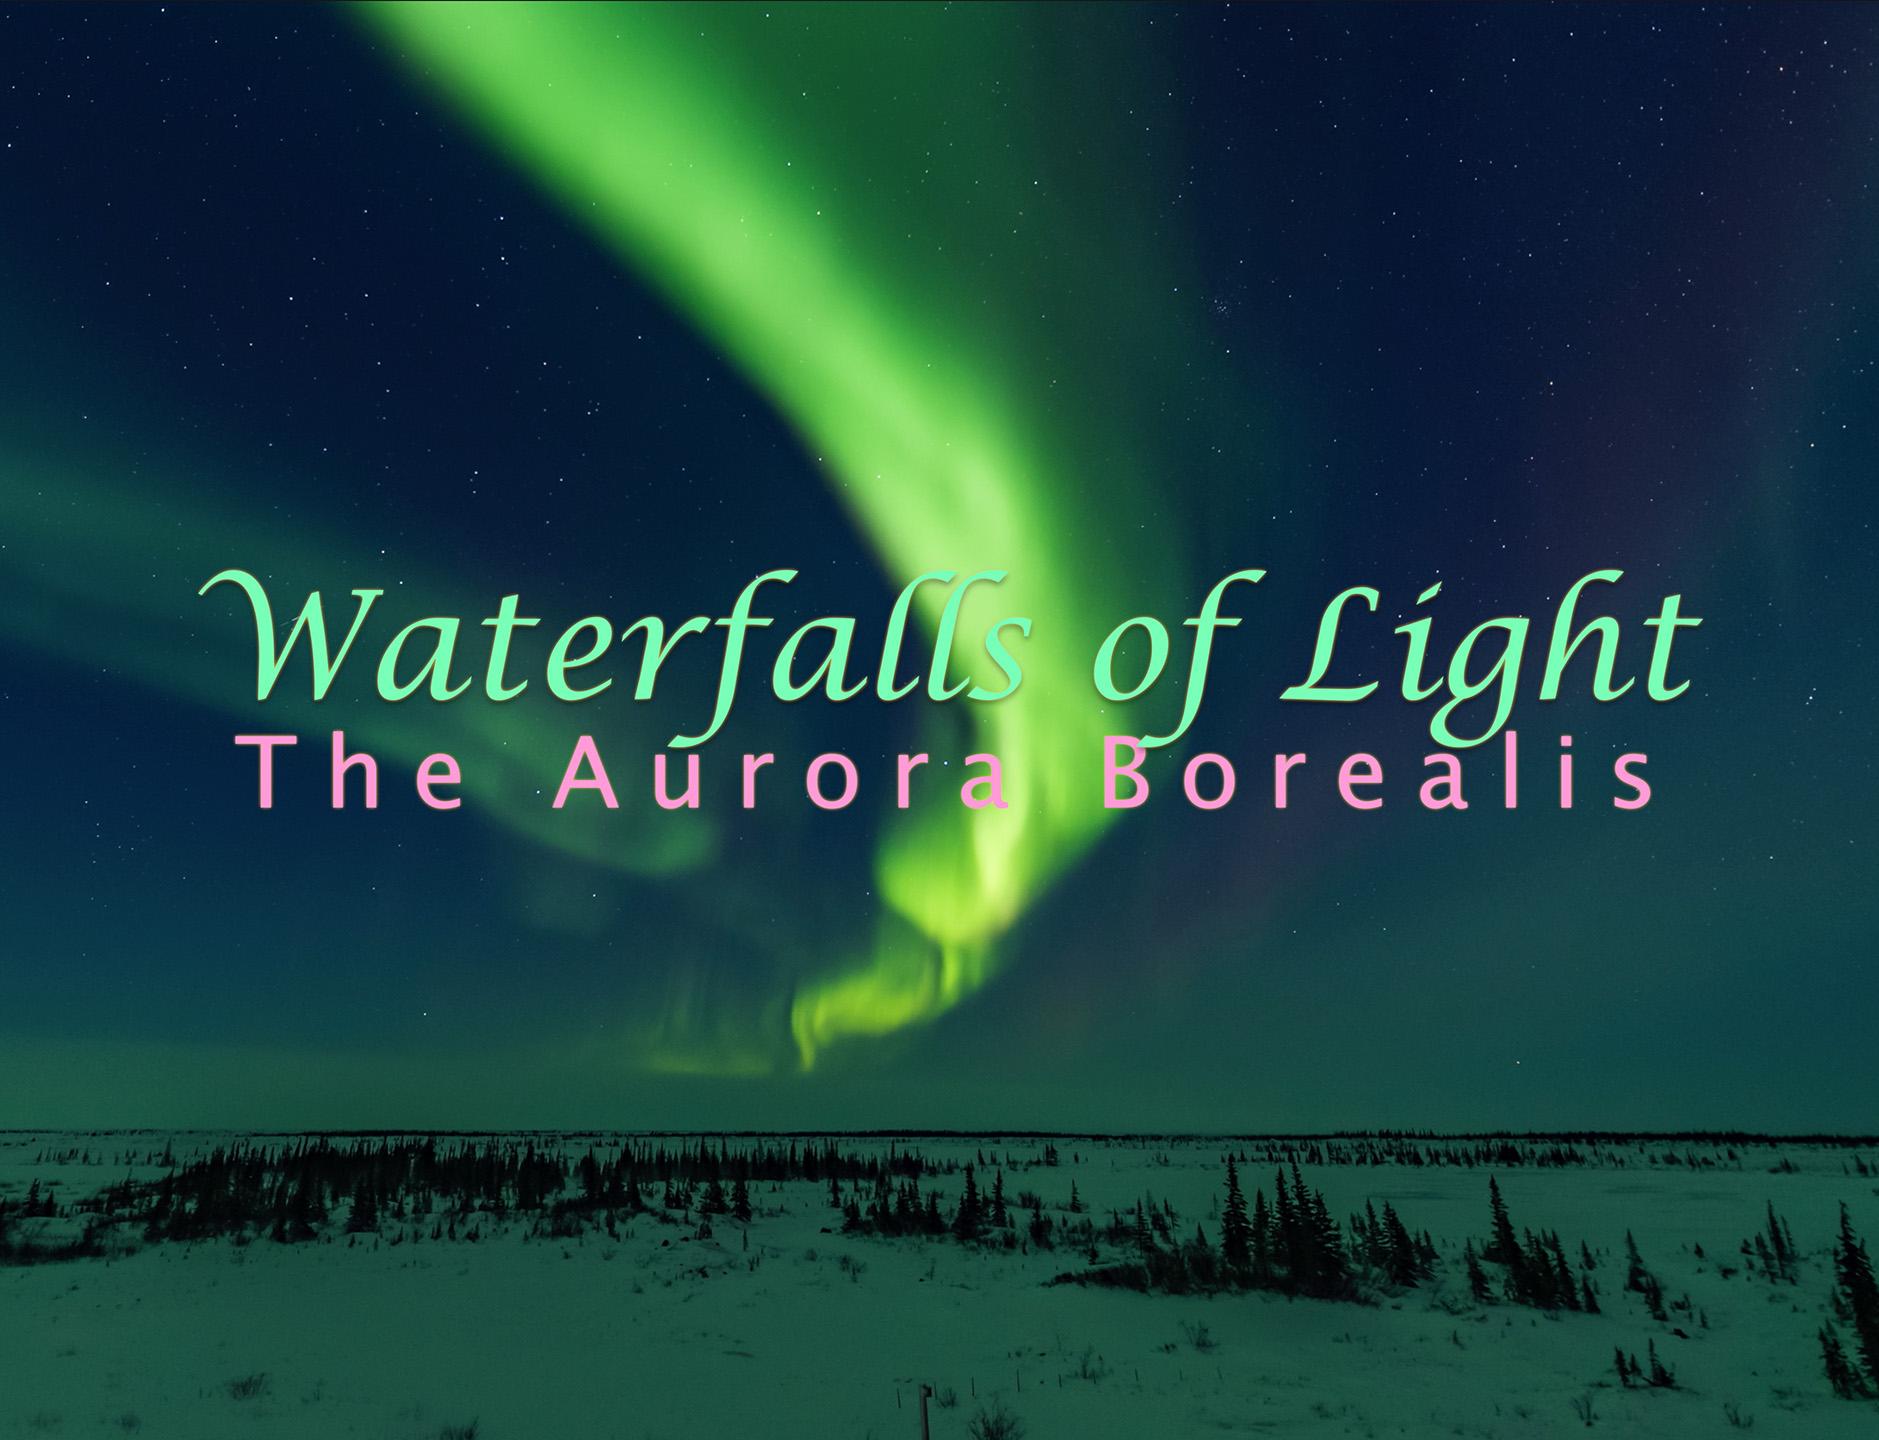 Waterfalls of Light – The Aurora – The Amazing Sky